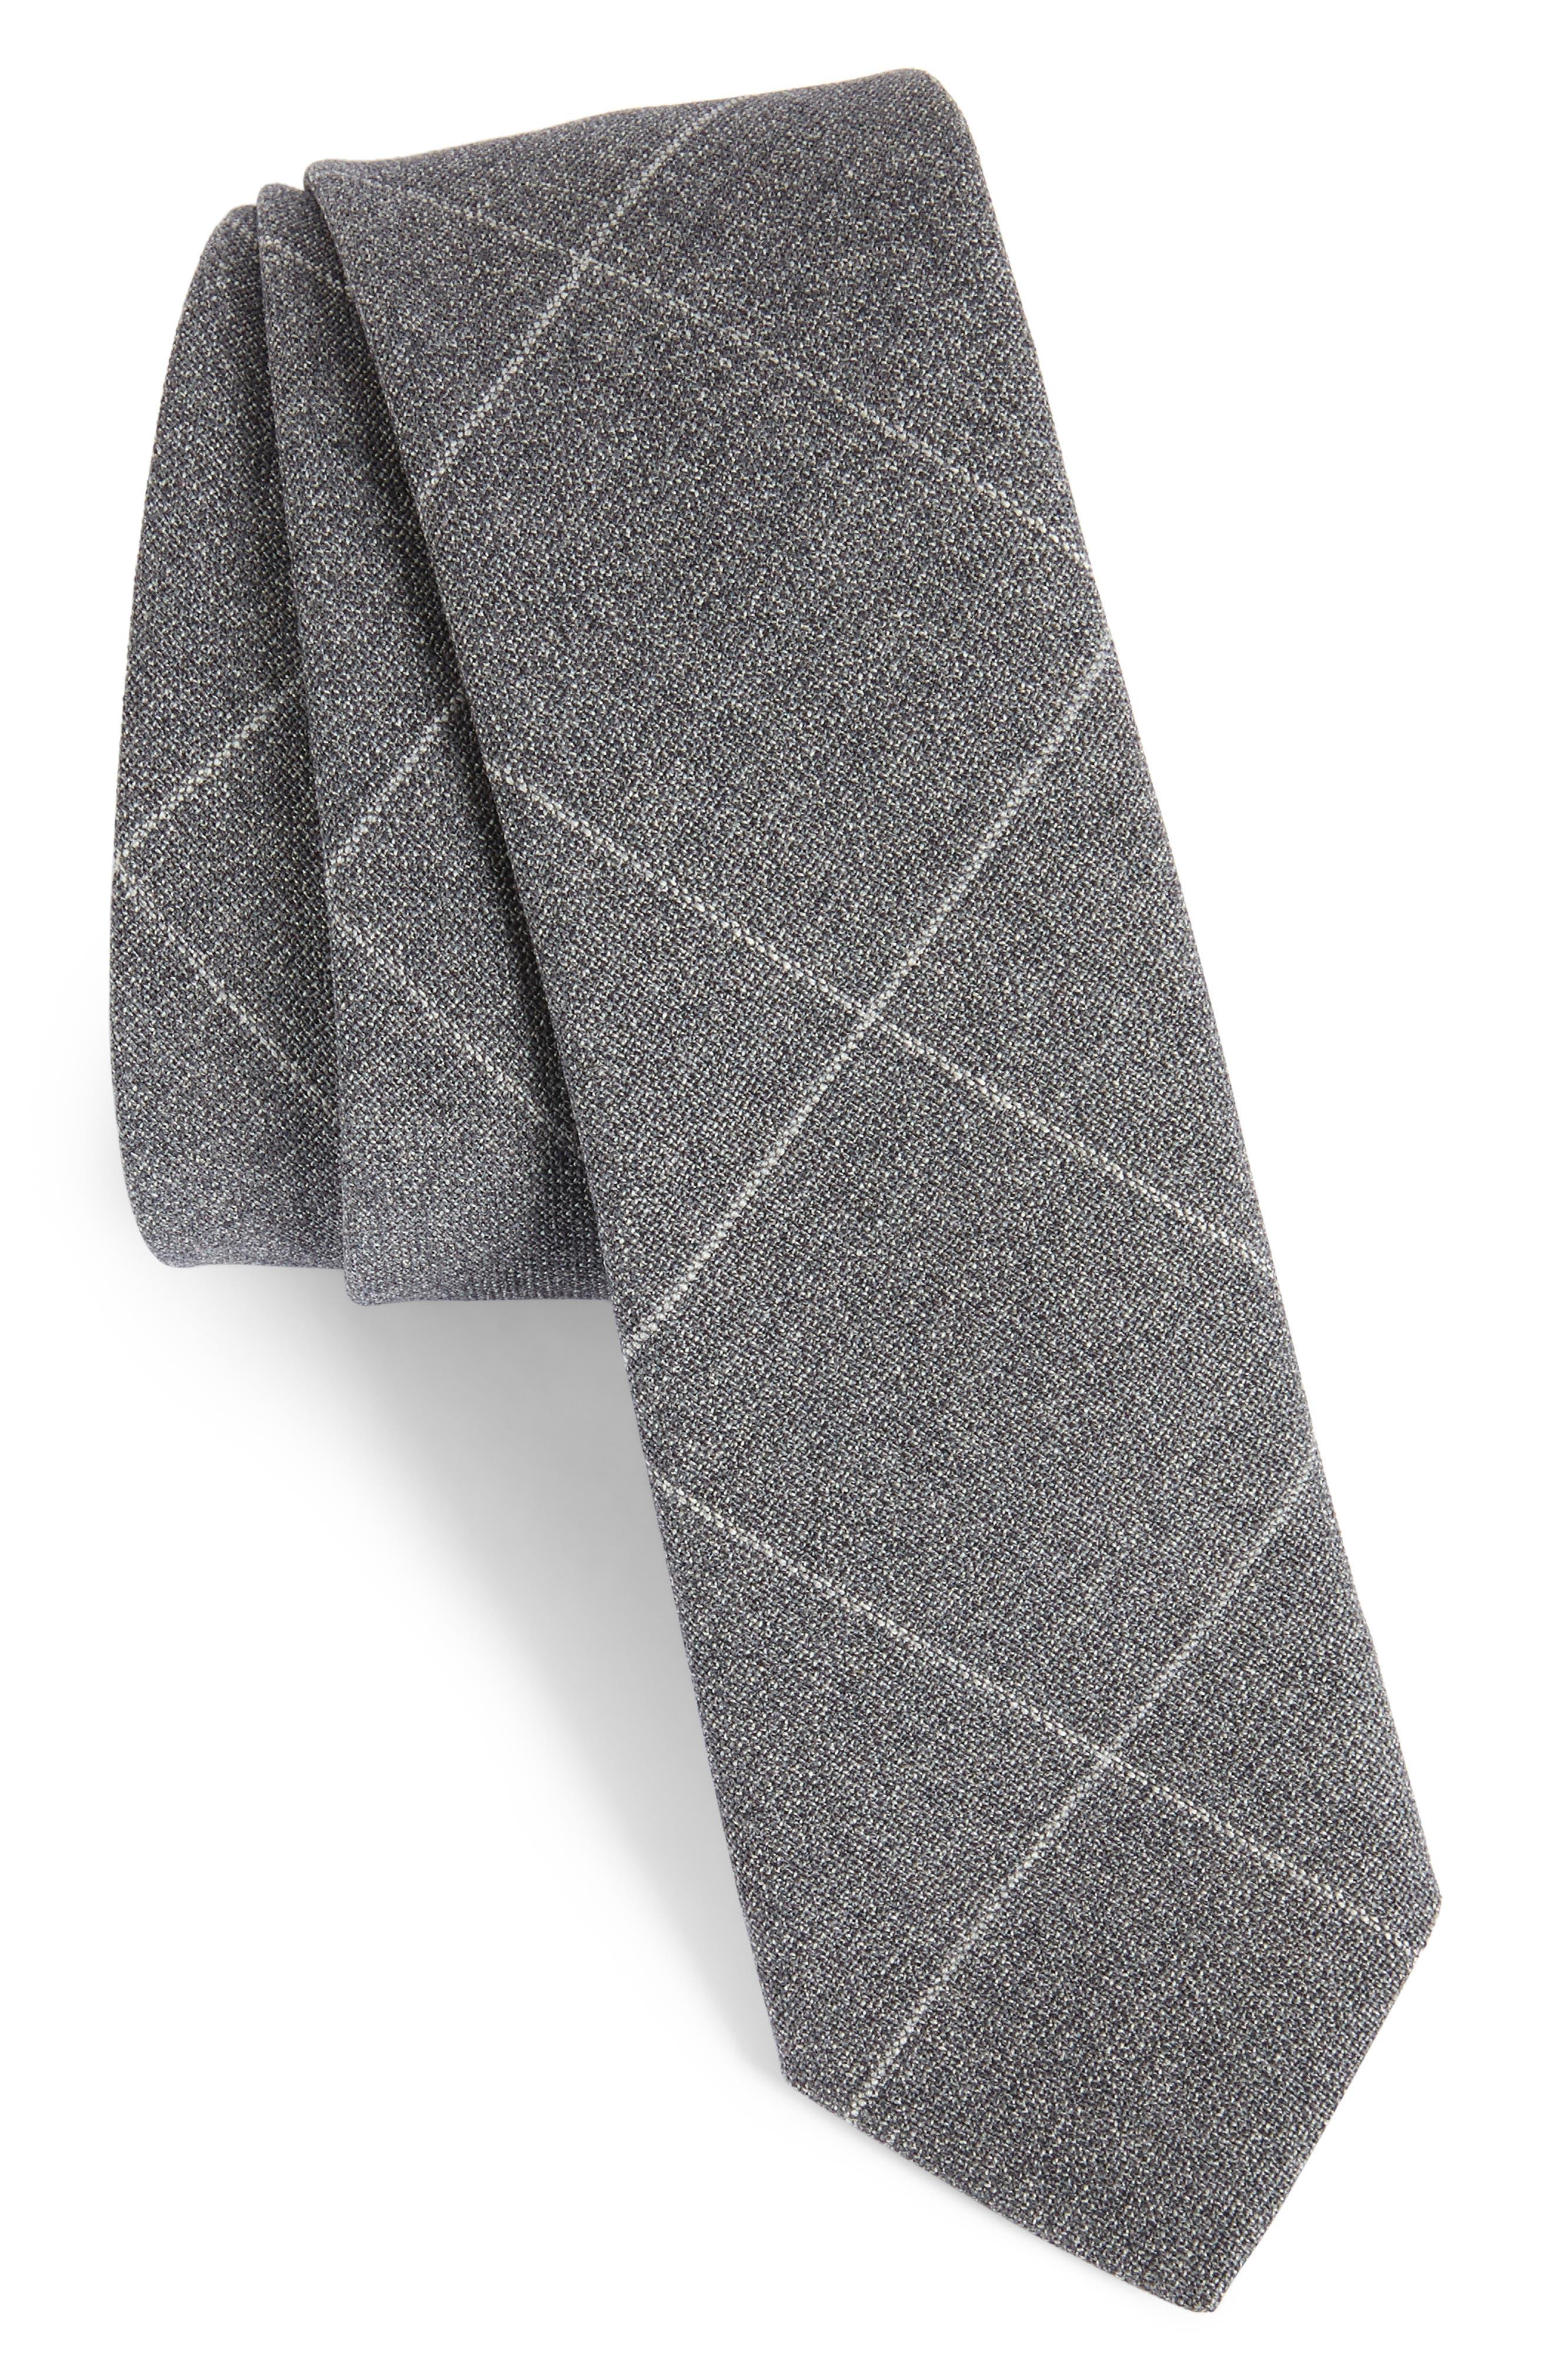 Tattersall Wool Skinny Tie,                             Main thumbnail 1, color,                             GREY